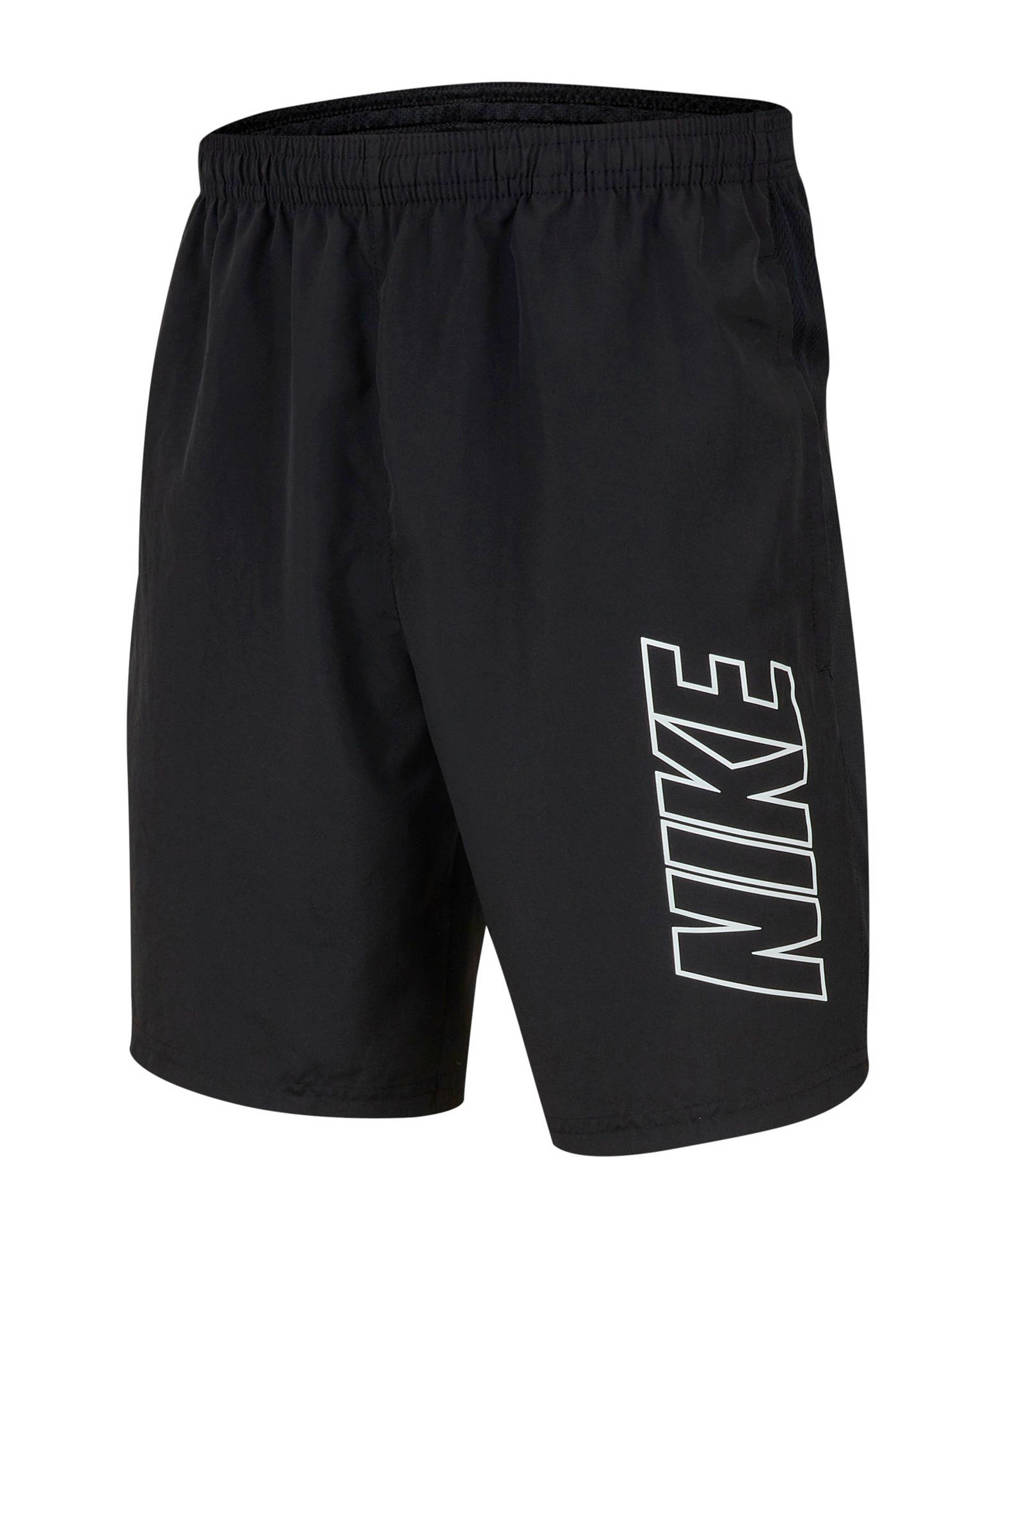 Nike Junior  voetbalshort zwart, Zwart